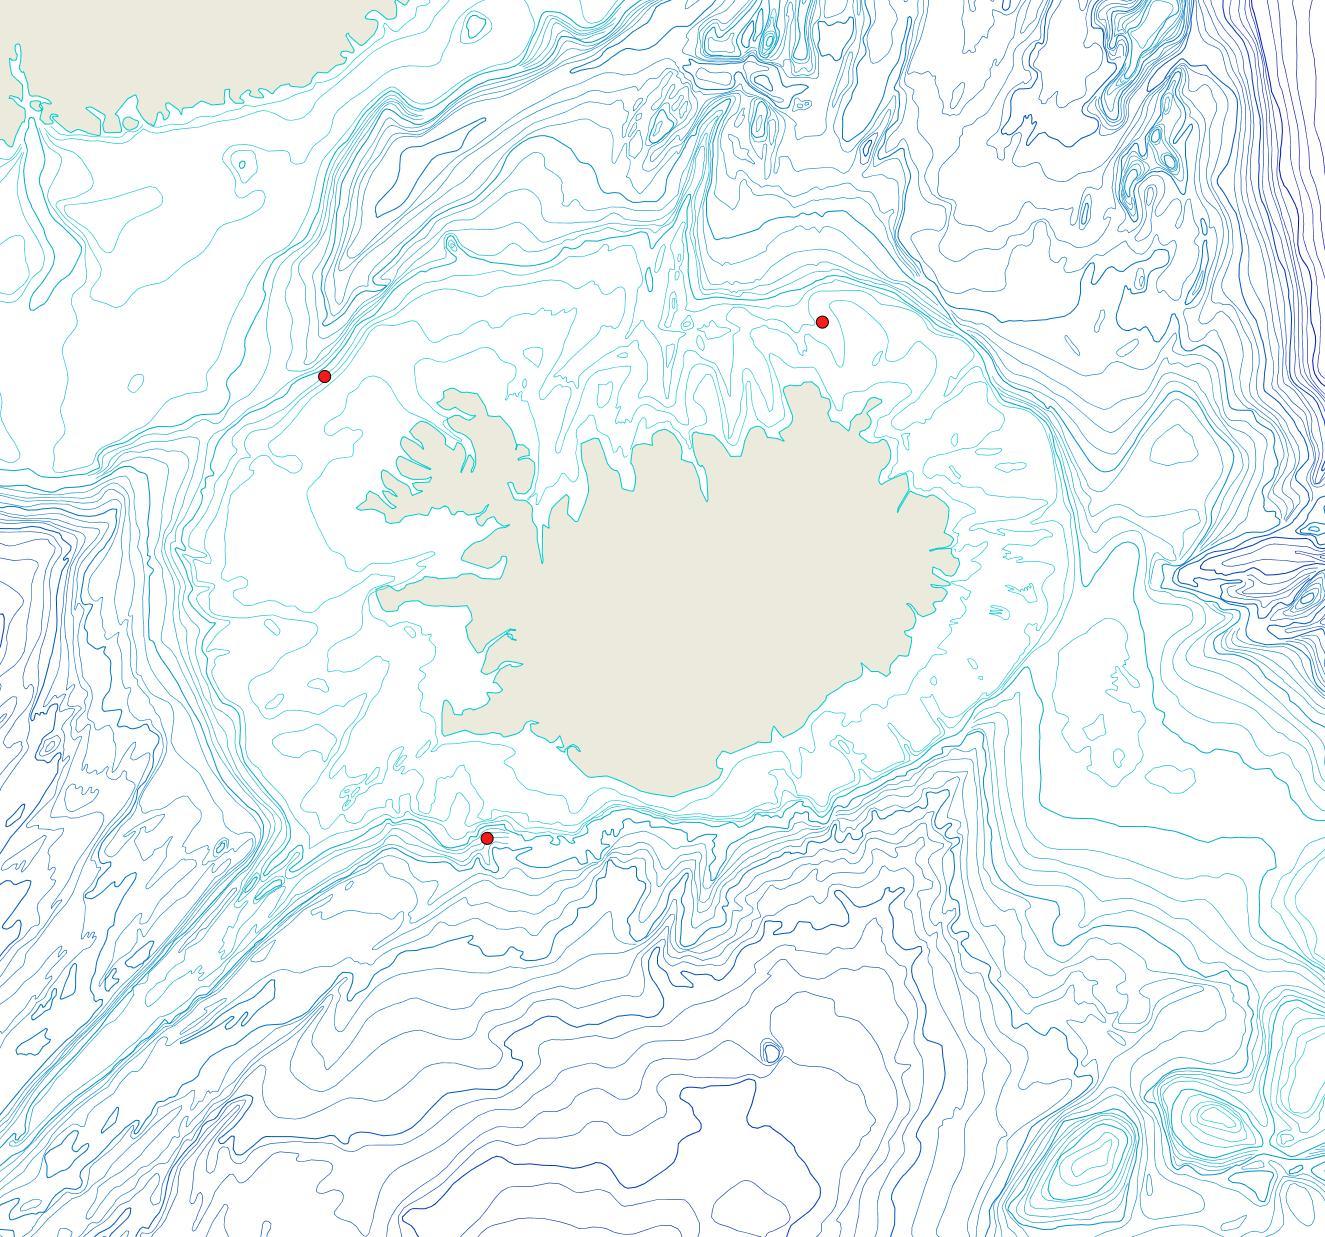 Útbreiðsla Notoplites sp.(Bioice samples, red dots)